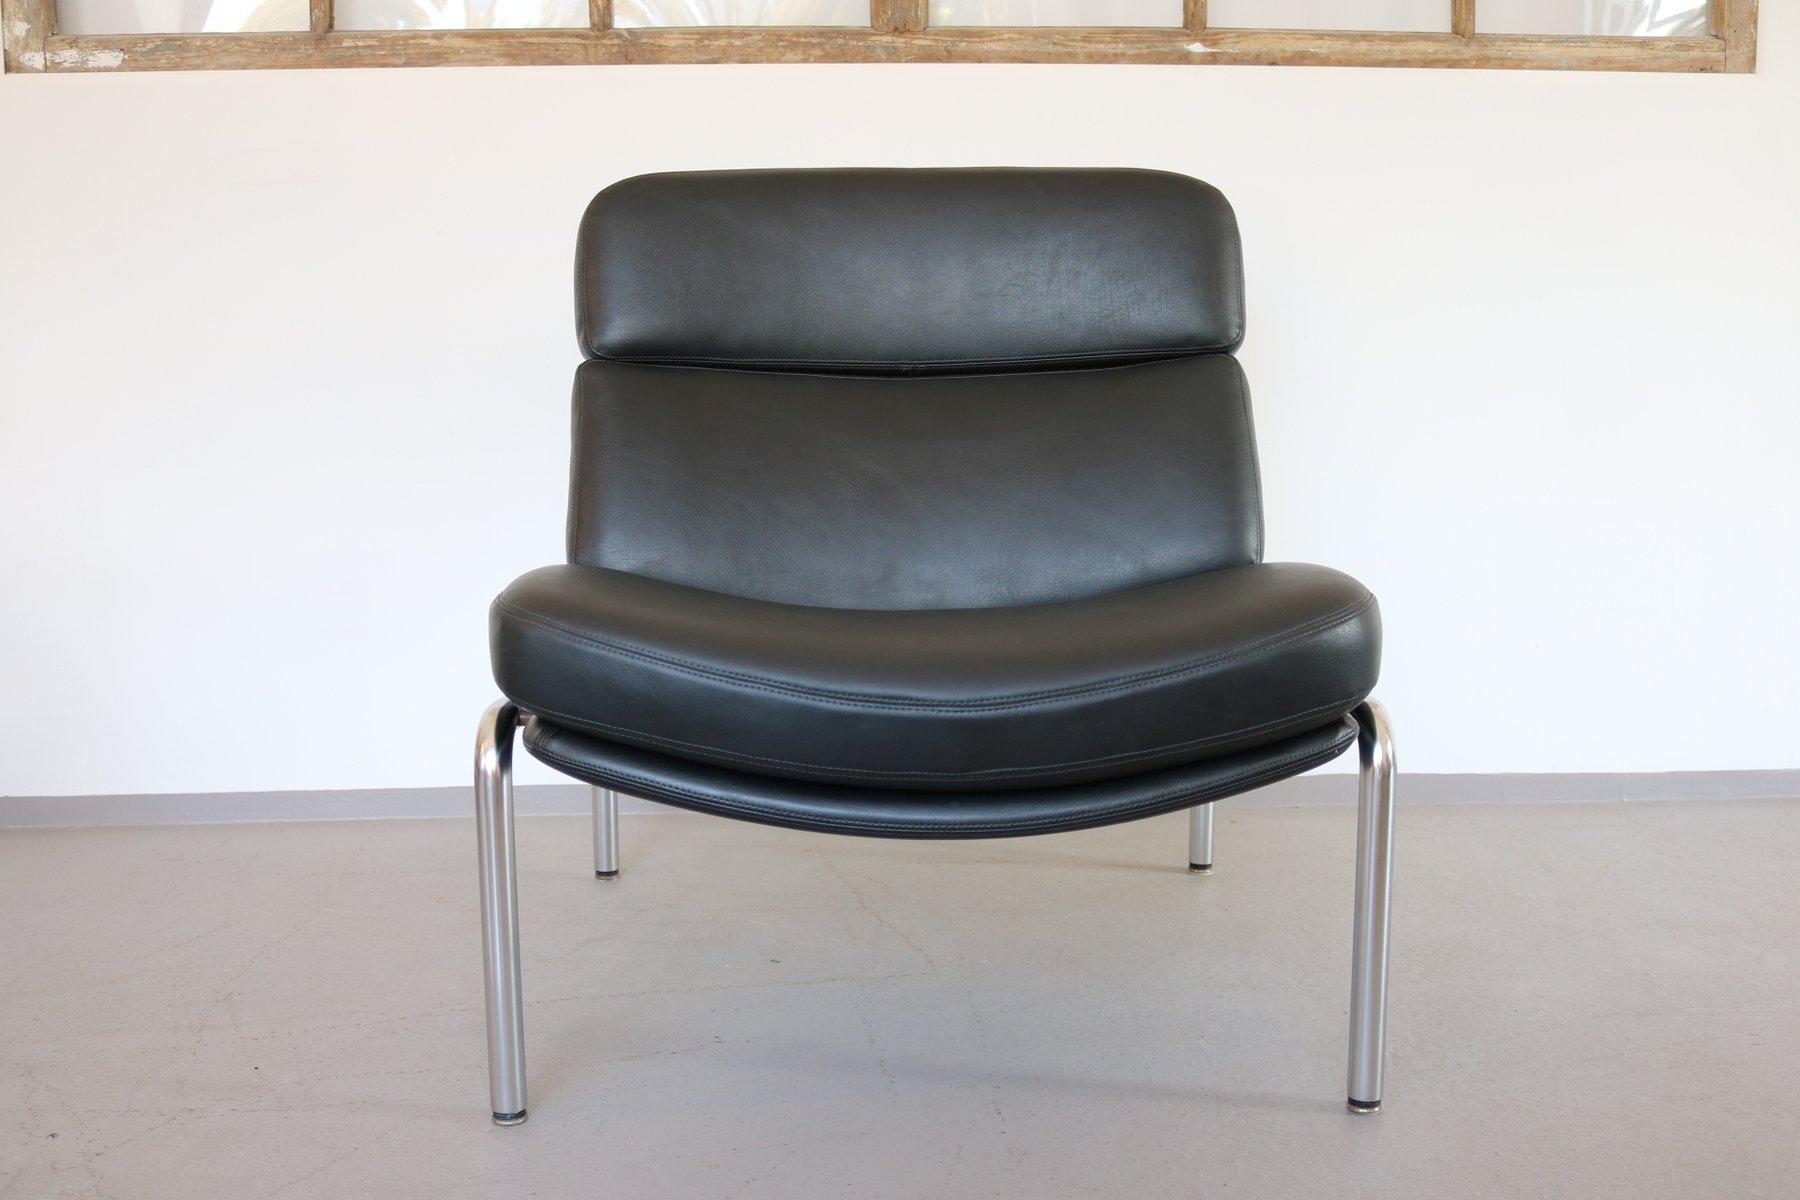 ledersessel von j rgen kastholm f r kusch co 1970 bei pamono kaufen. Black Bedroom Furniture Sets. Home Design Ideas